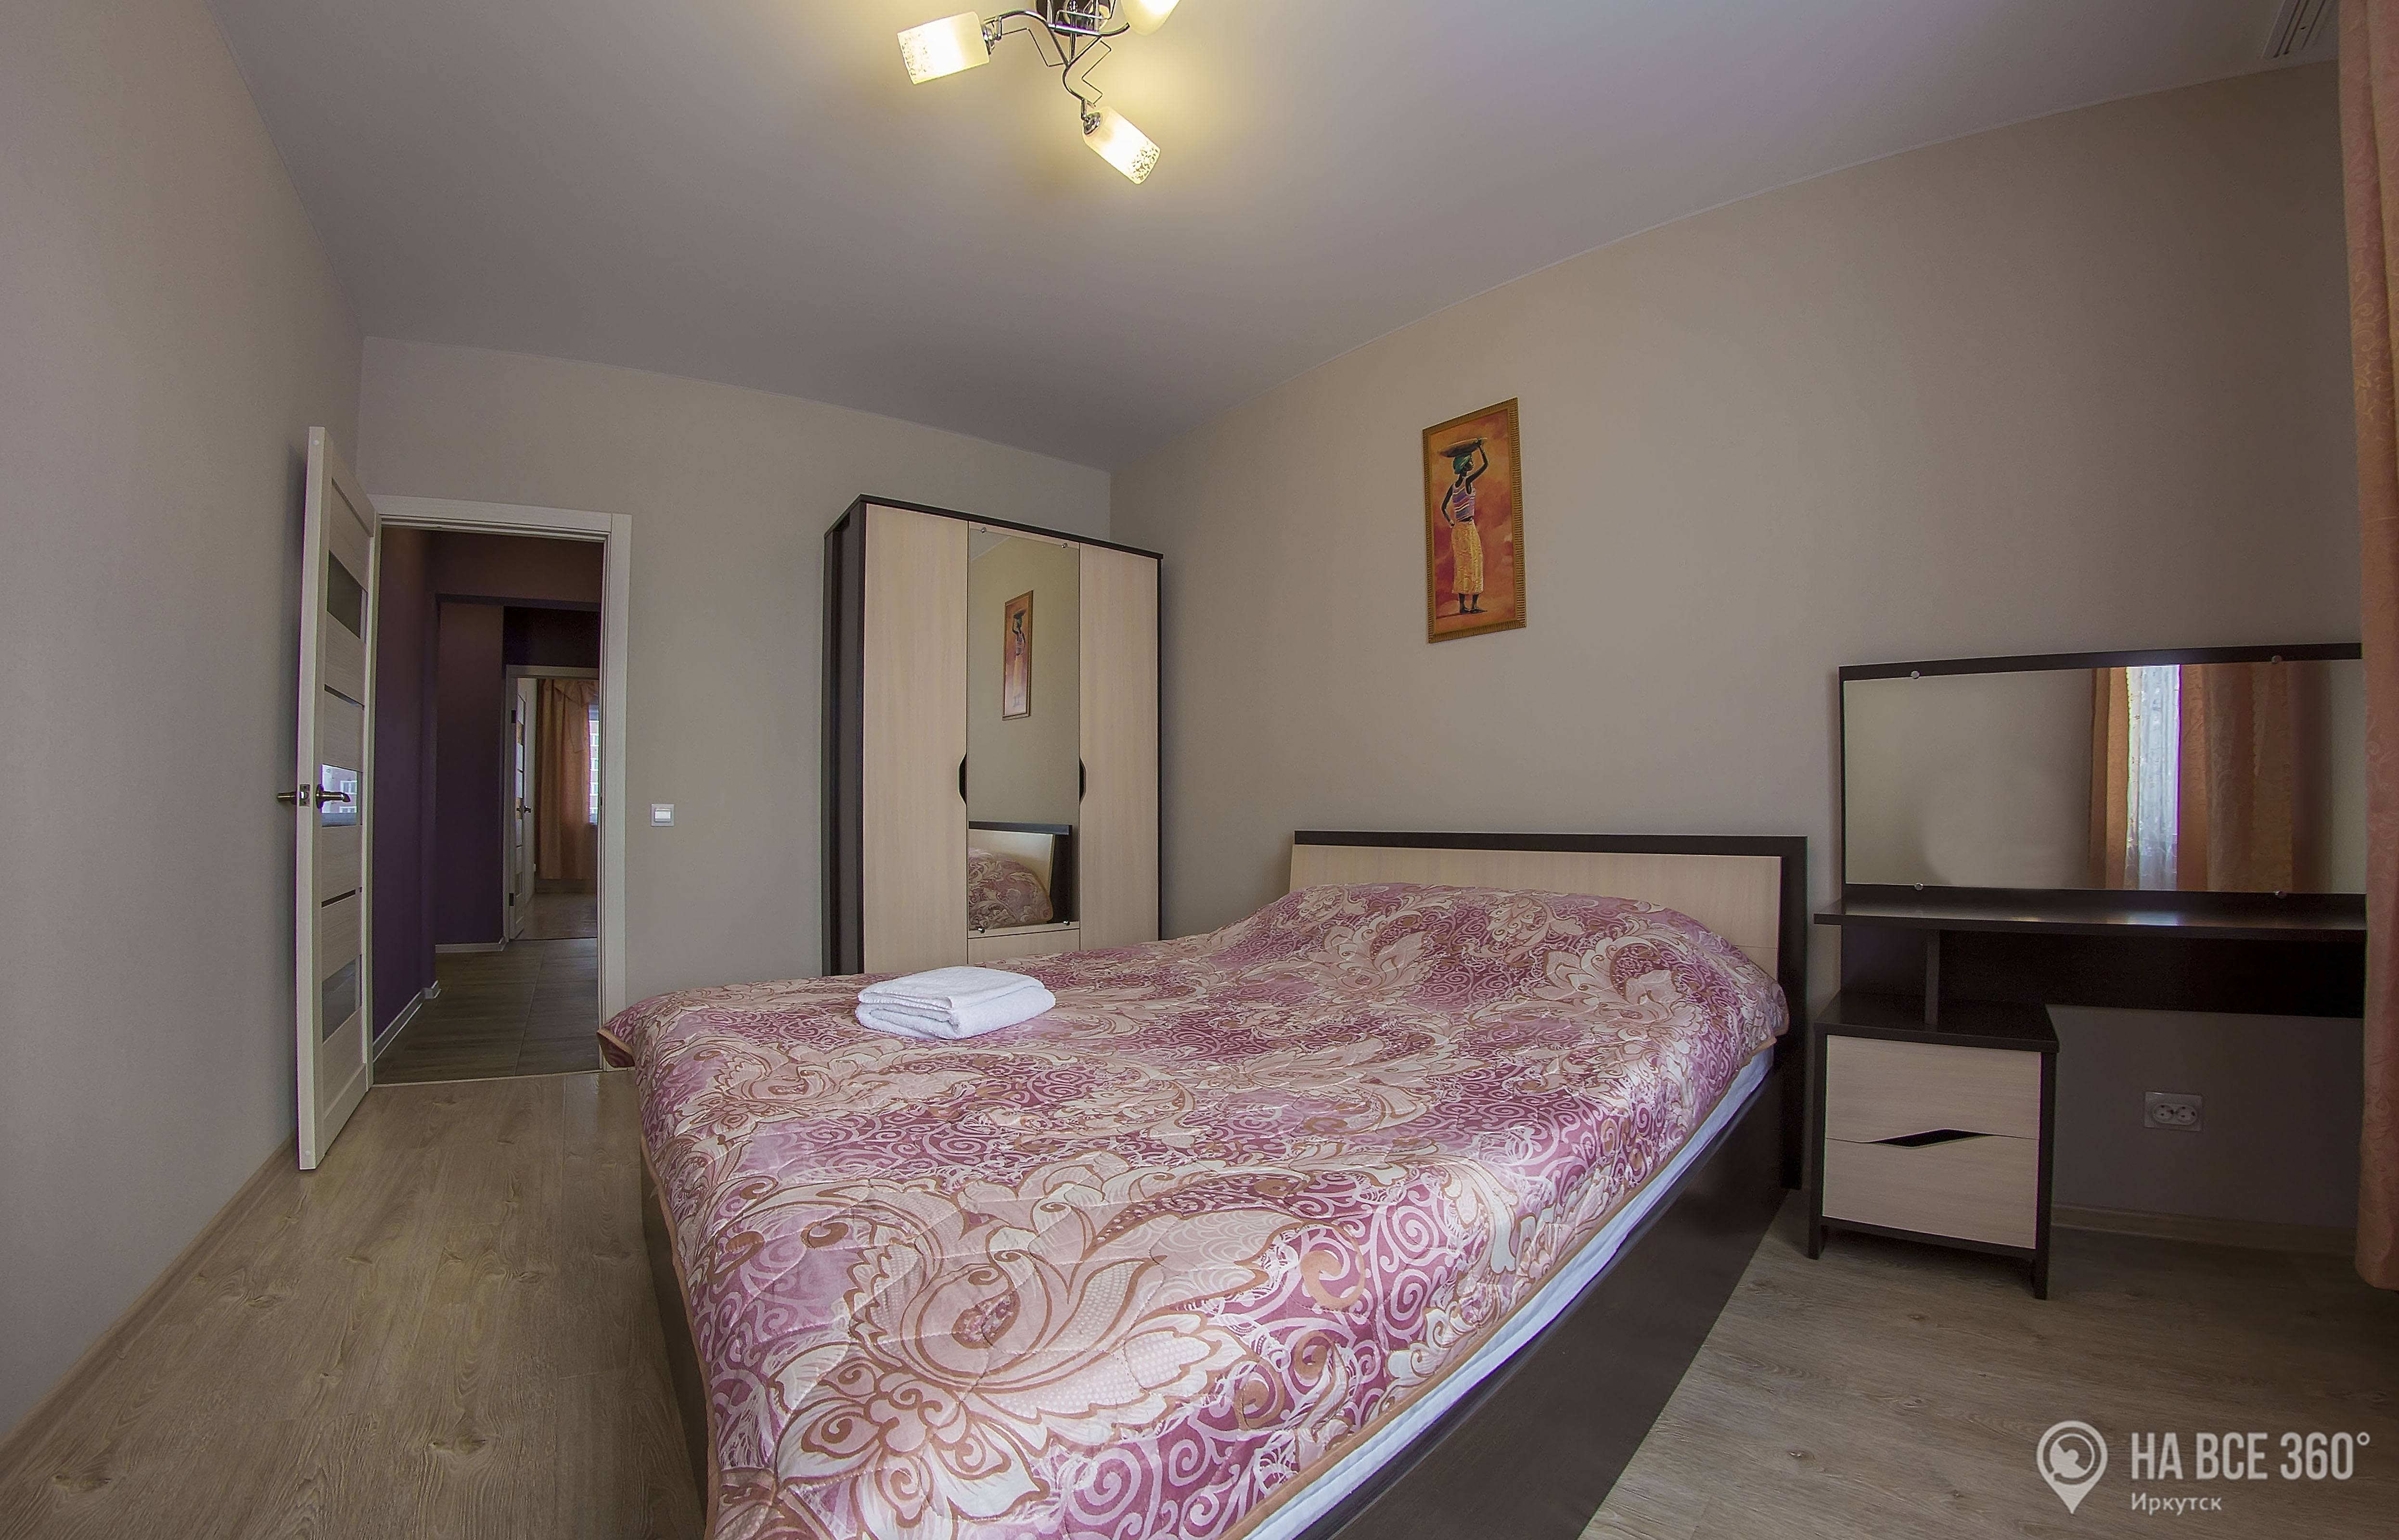 трехкомнатная квартира посуточно в иркутске